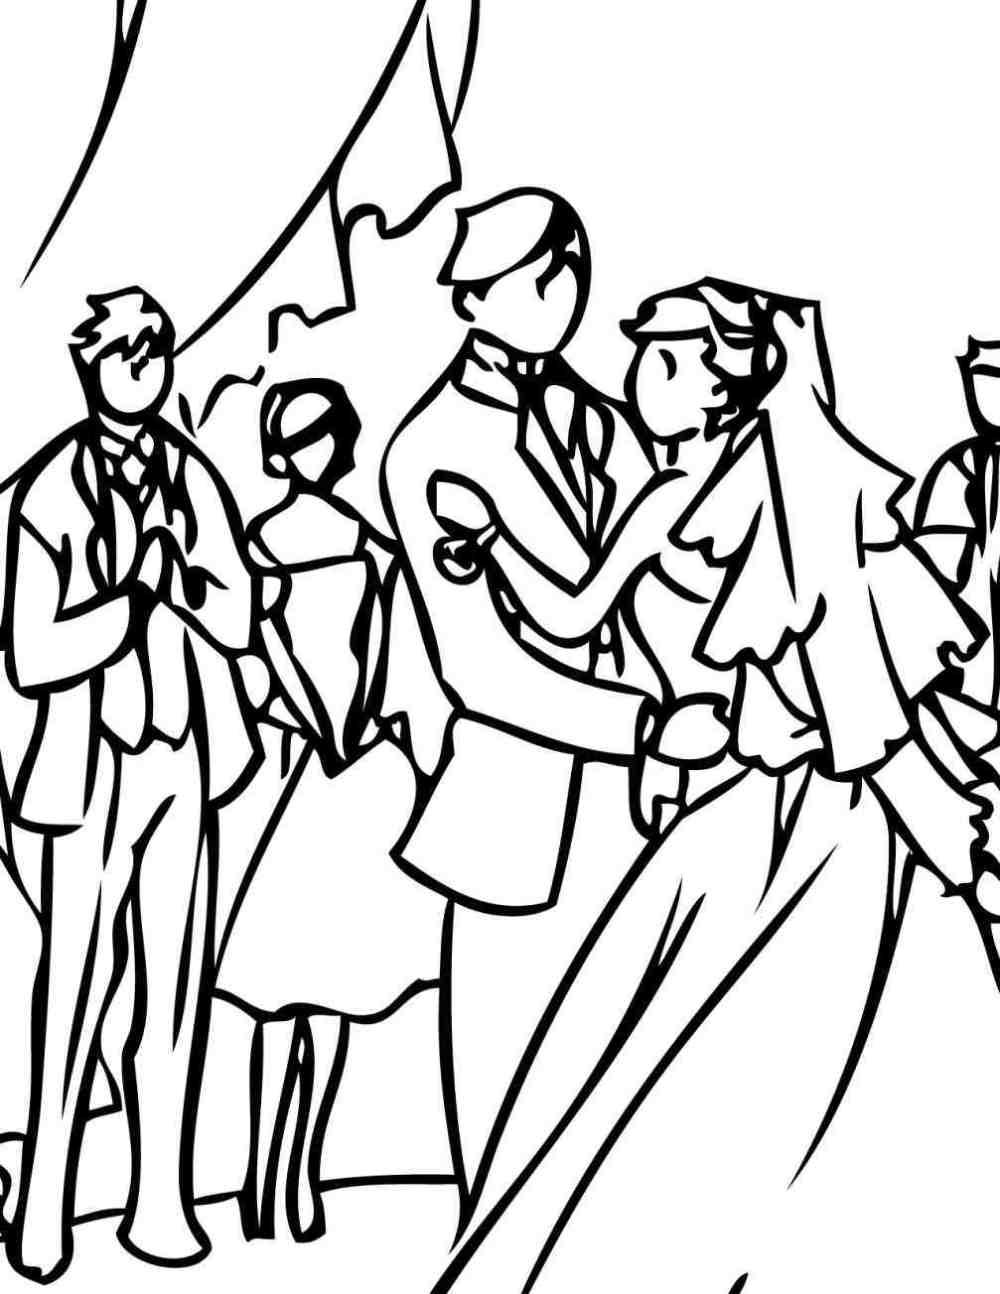 medium resolution of 1007x1304 bride wedding reception dancing clipart s free download clip art